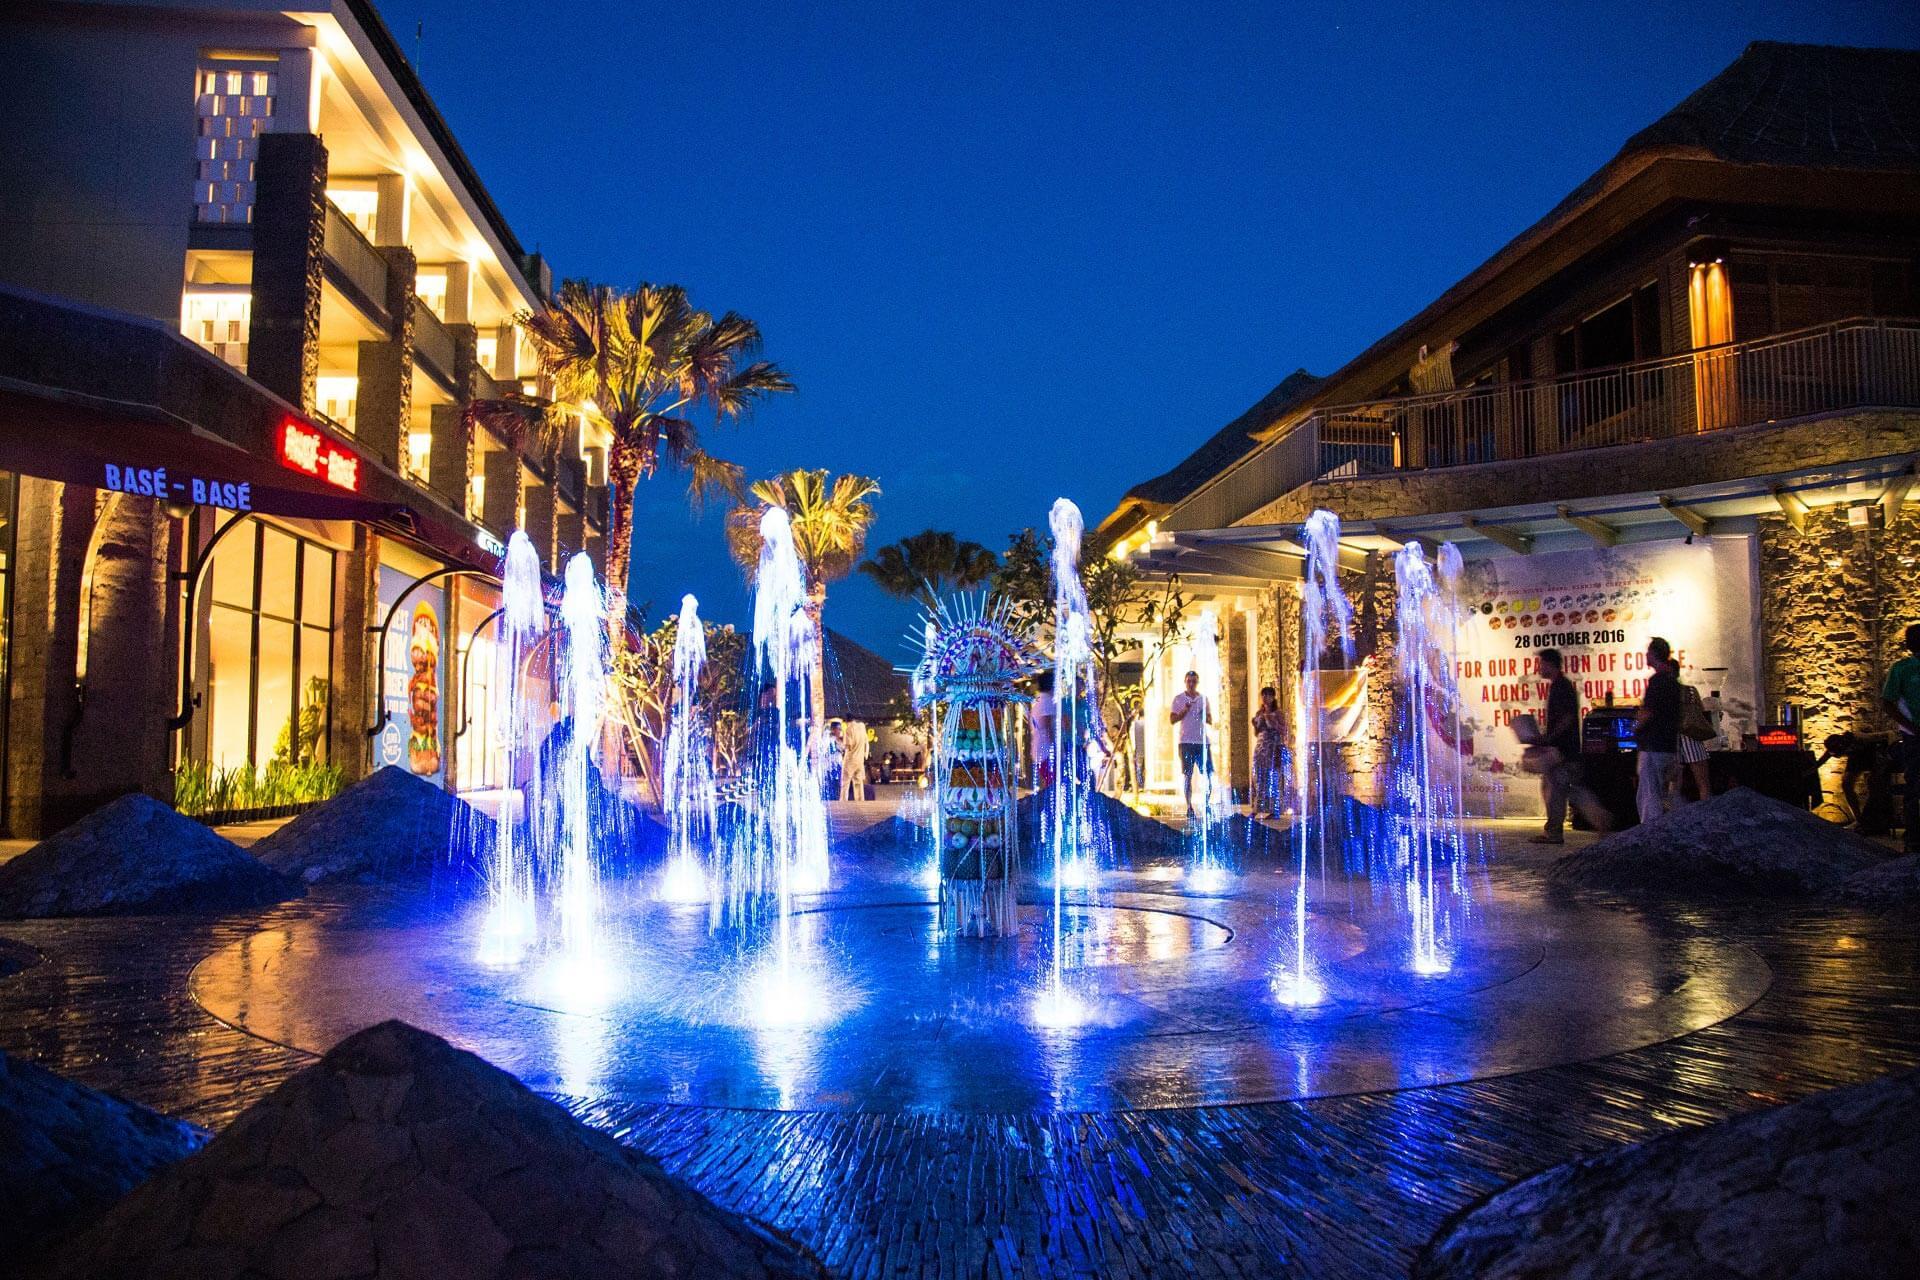 Samasta Jimbaran: Instagrammable Lifestyle Village in Bali